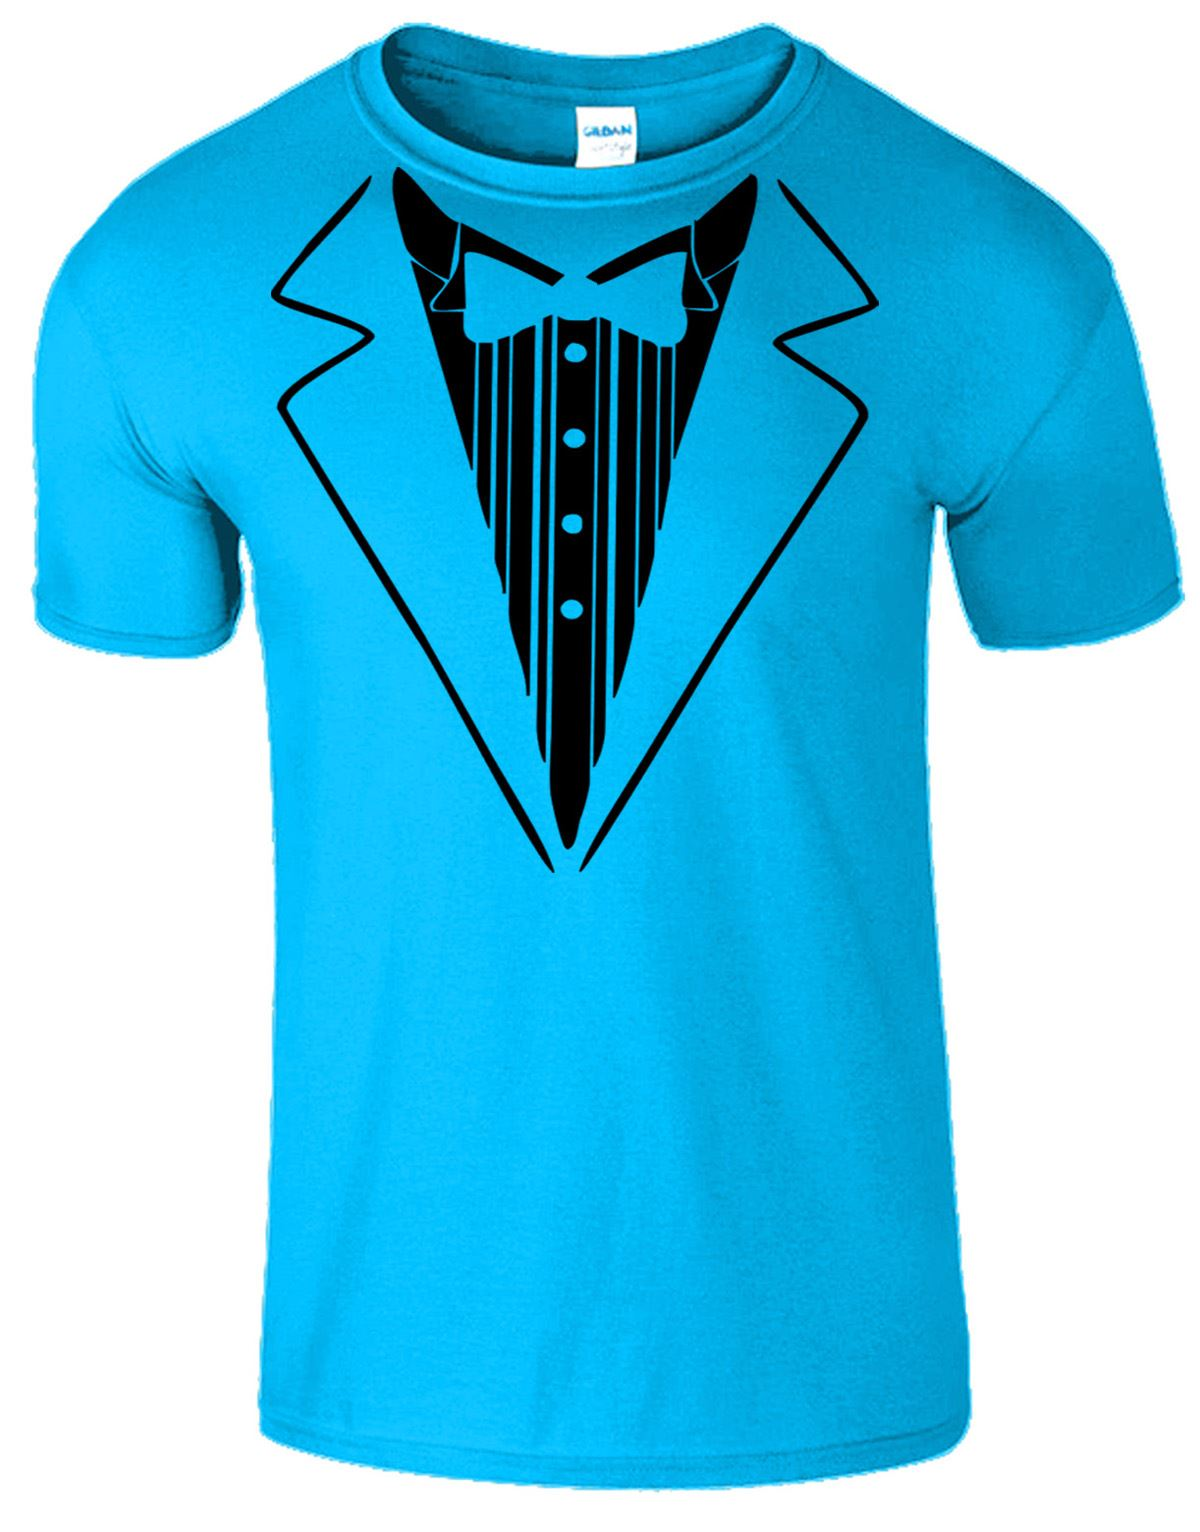 Tuxedo Kids Tshirt Awesome Style Boys Wedding Stag Funny Dress Bow ...